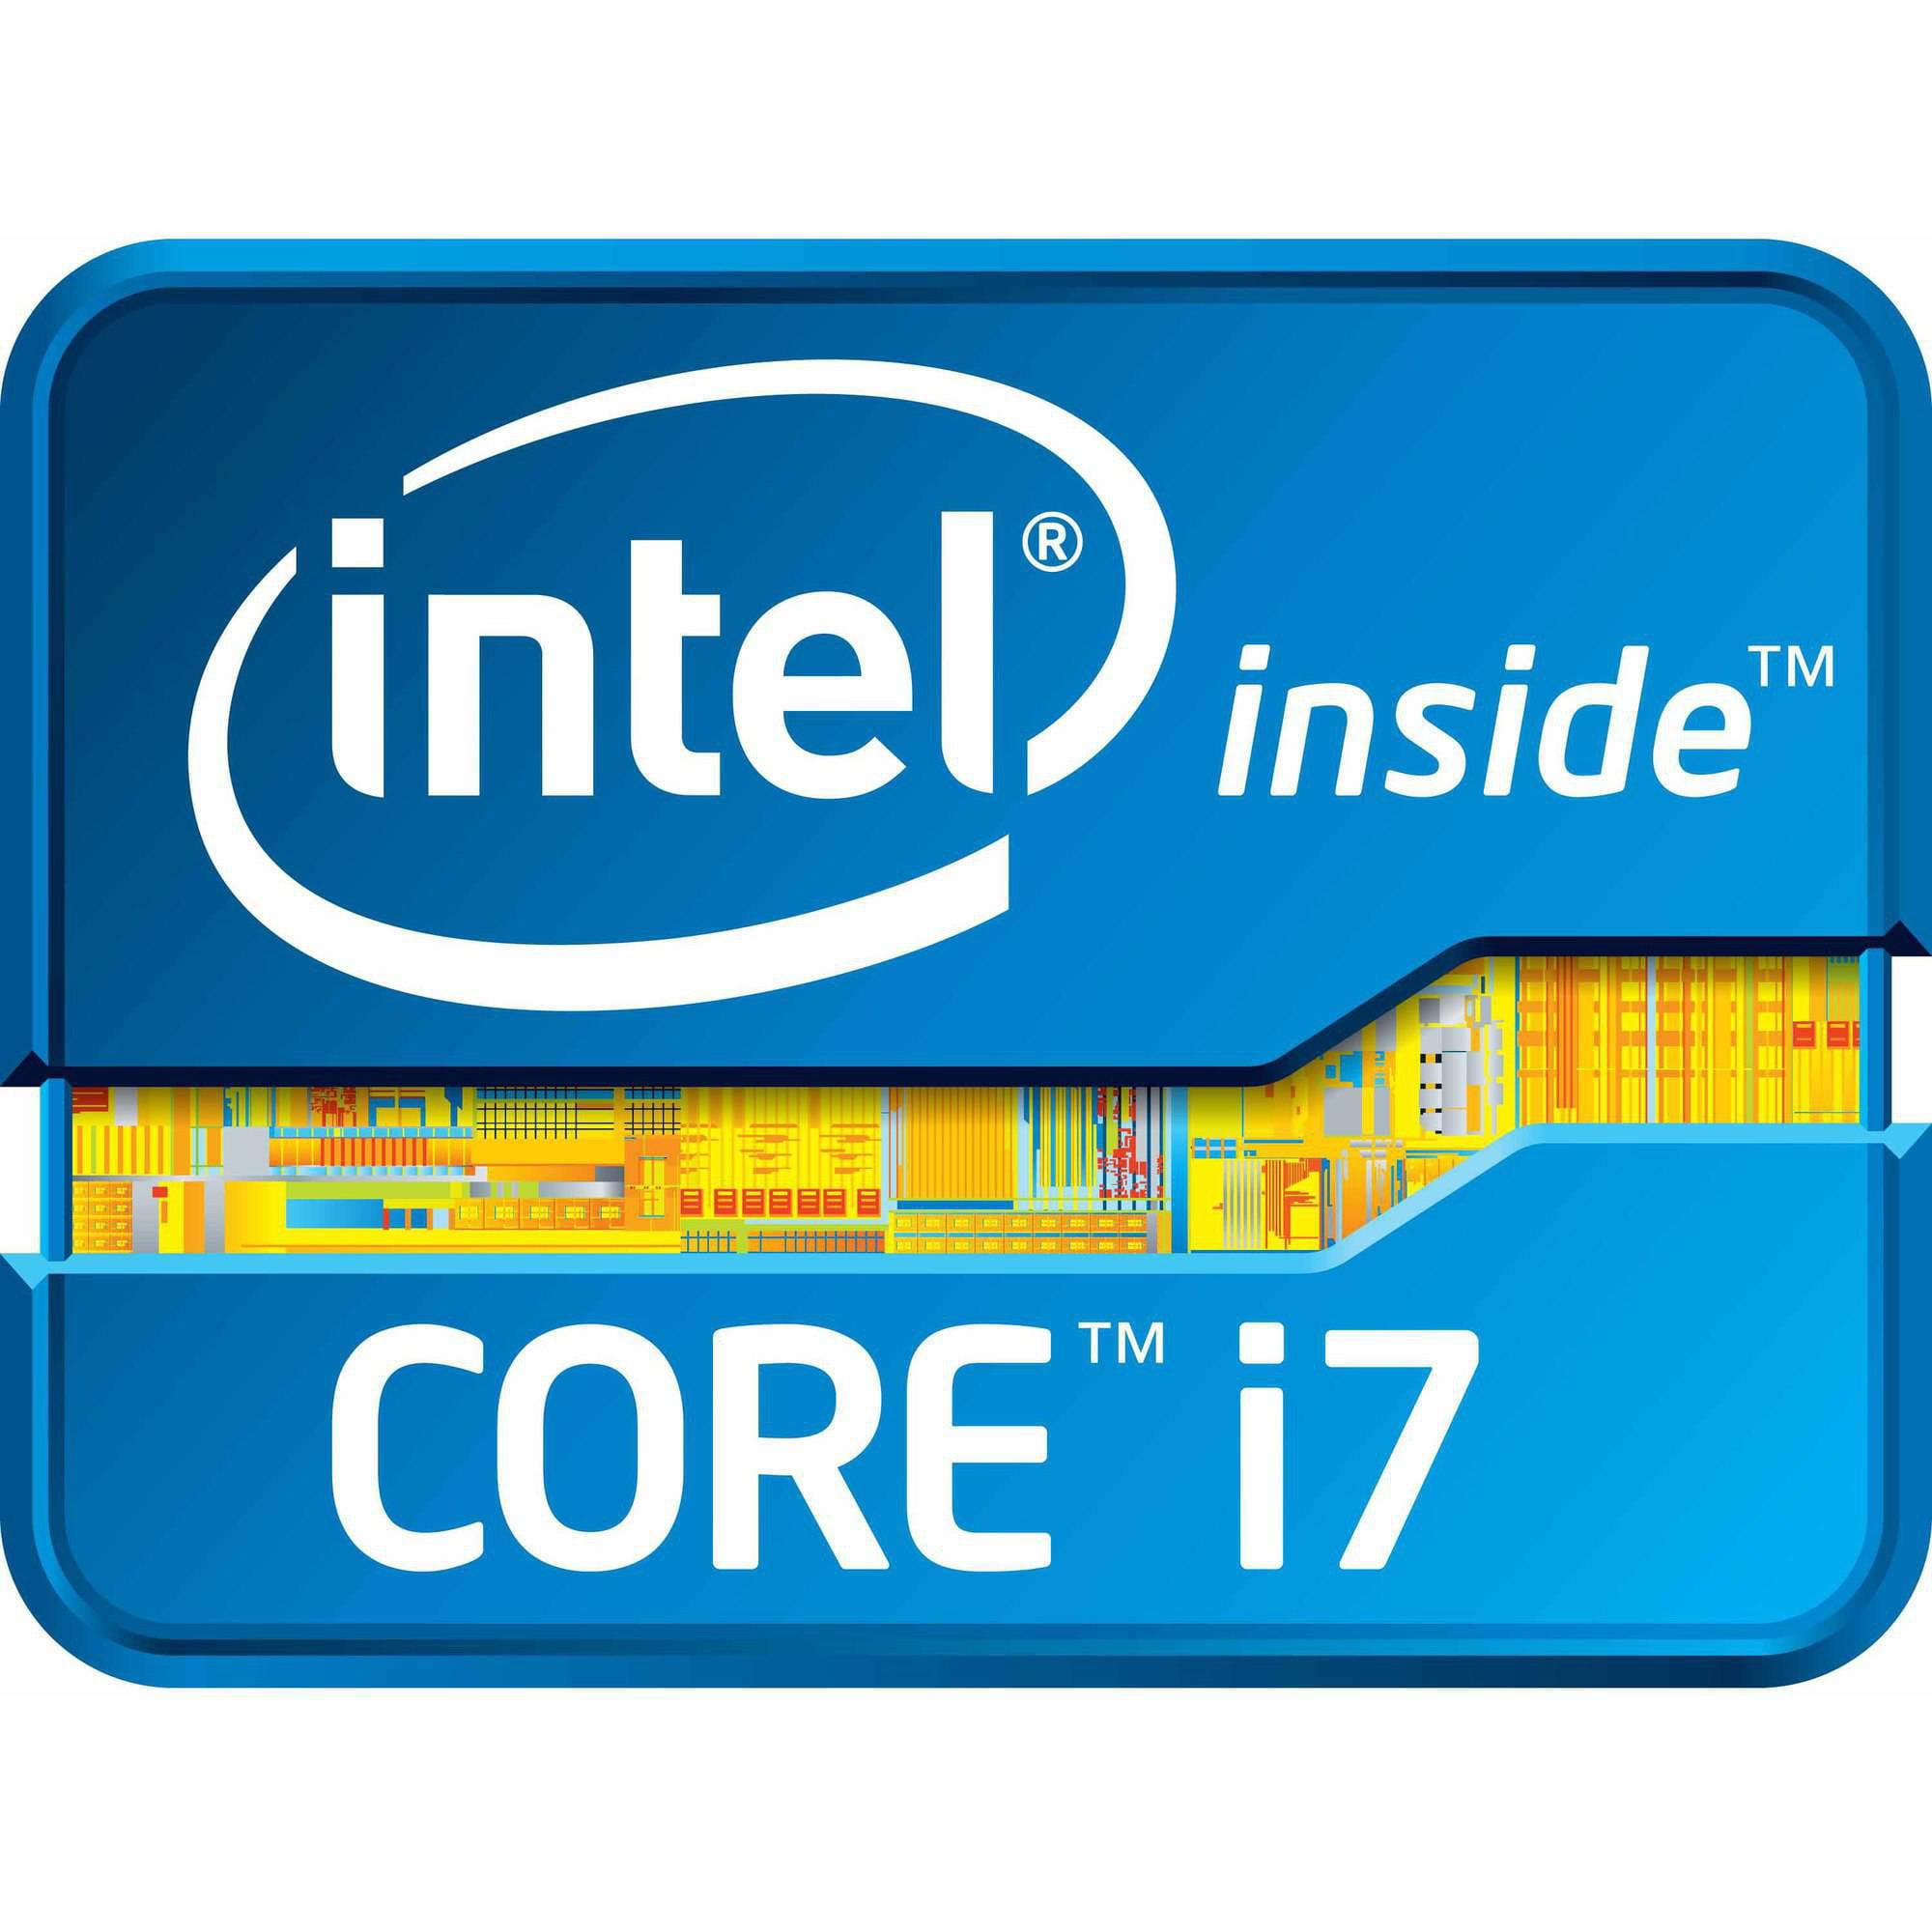 Intel Core i7-6700K Skylake Quad-Core Processor